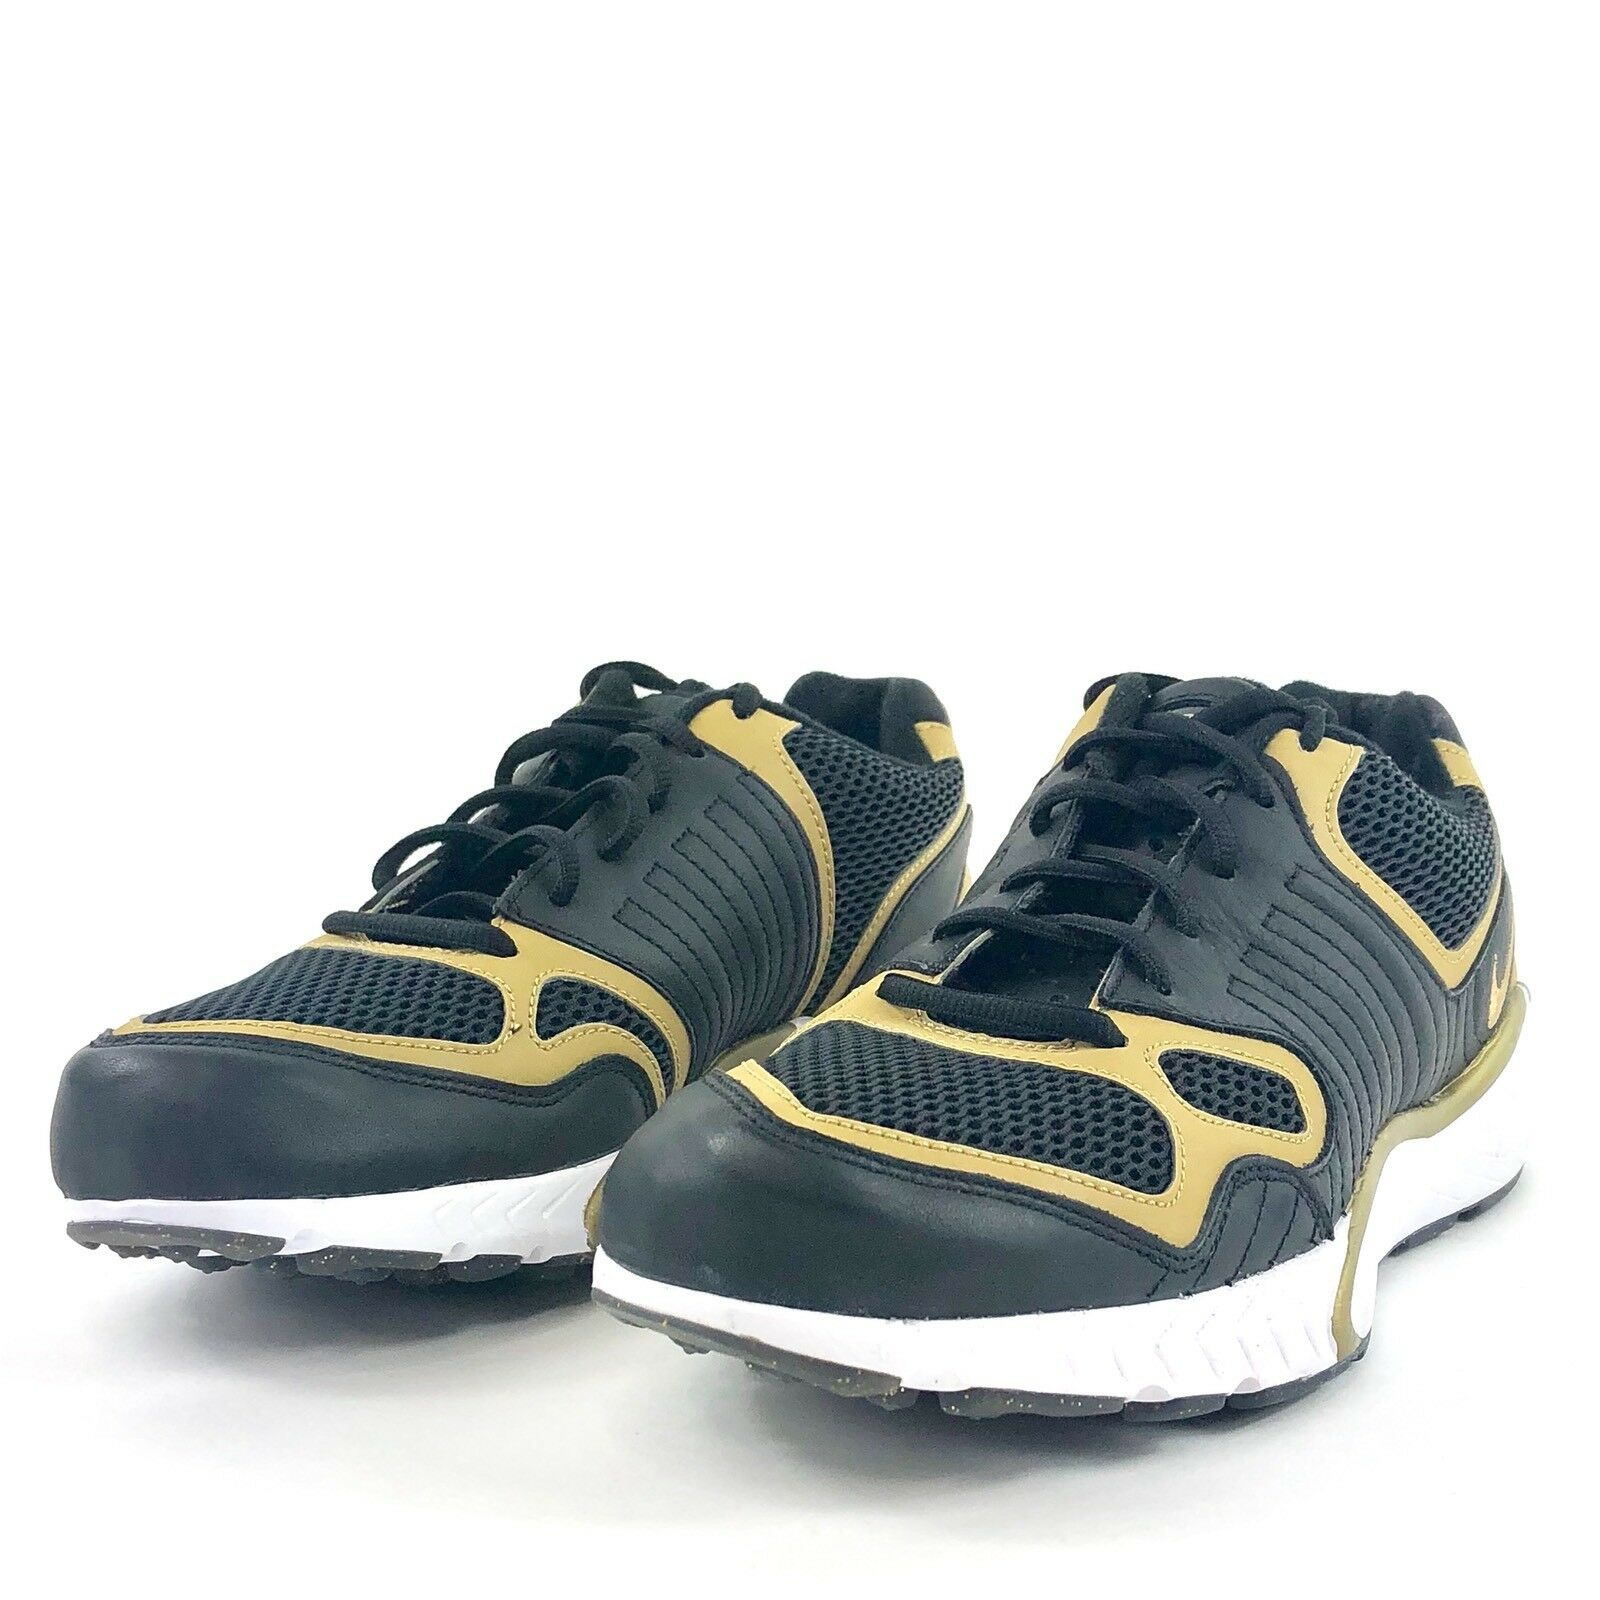 Nike Air Zoom Talaria Mens Shoes 844695 077  Black Metallic Gold Sz 9